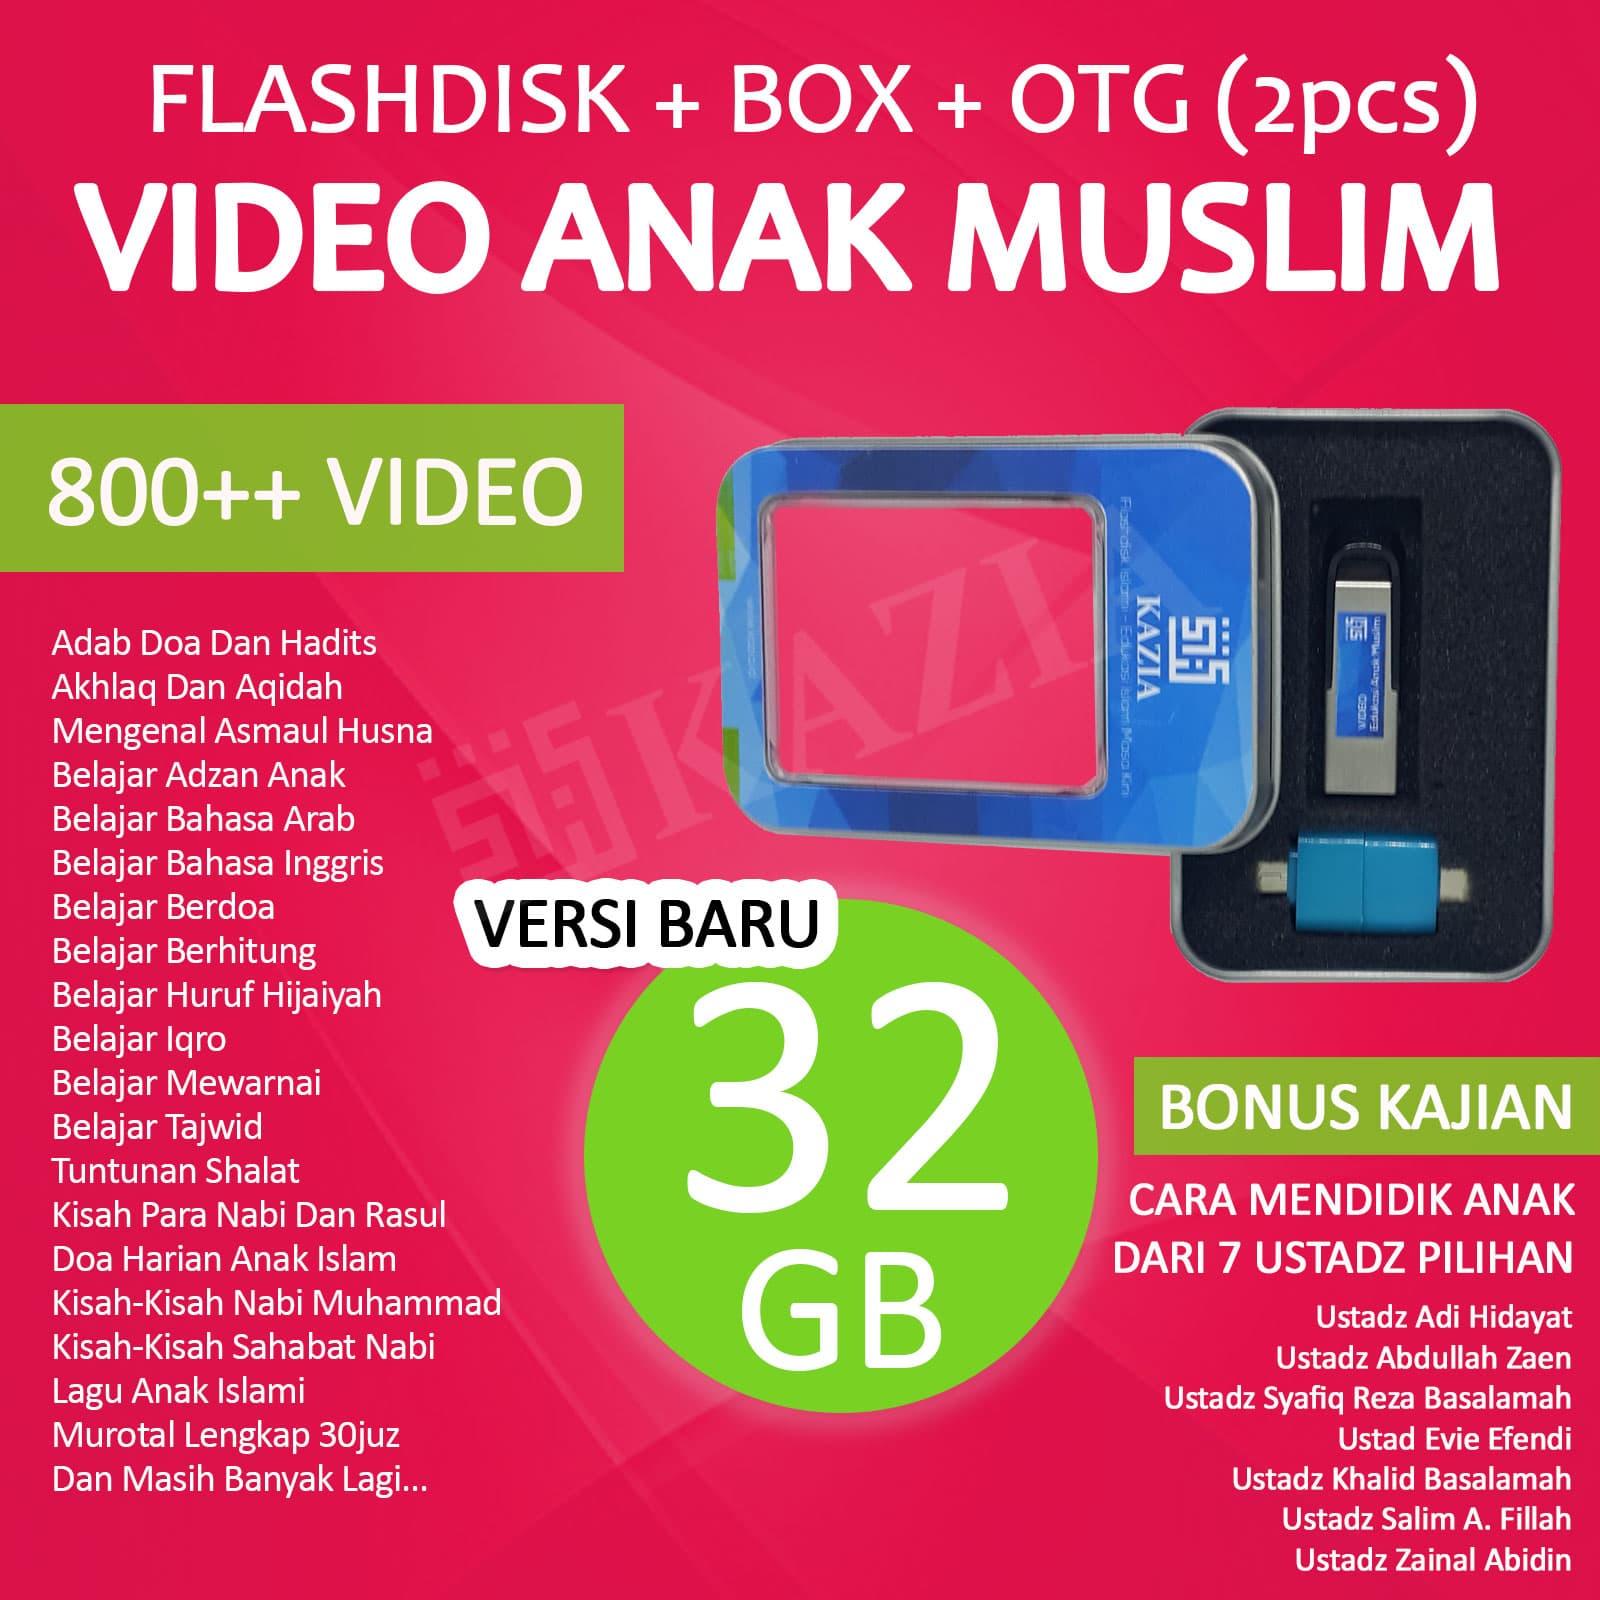 Jual Flashdisk Video Edukasi Anak Muslim 32GB Bonus BOX OTG Dan Ceramah Kazia Flashdisk Islami